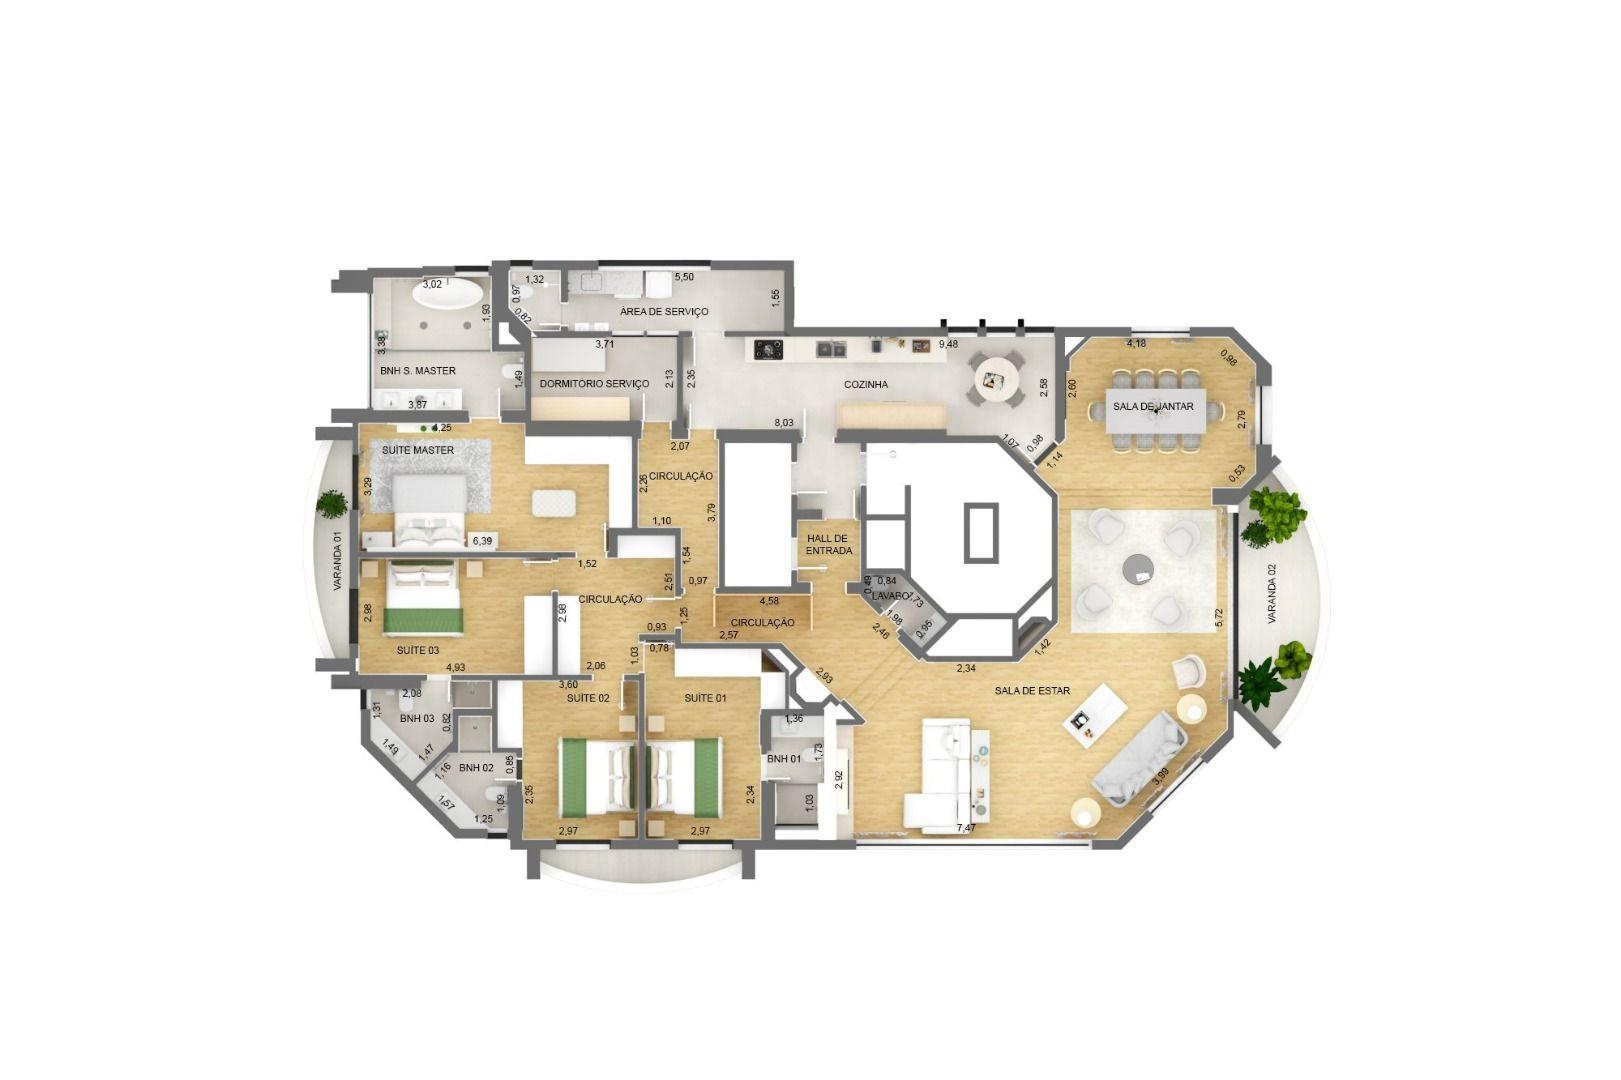 312 M² - 4 SUÍTES. (Apartamento 11, 1º andar).